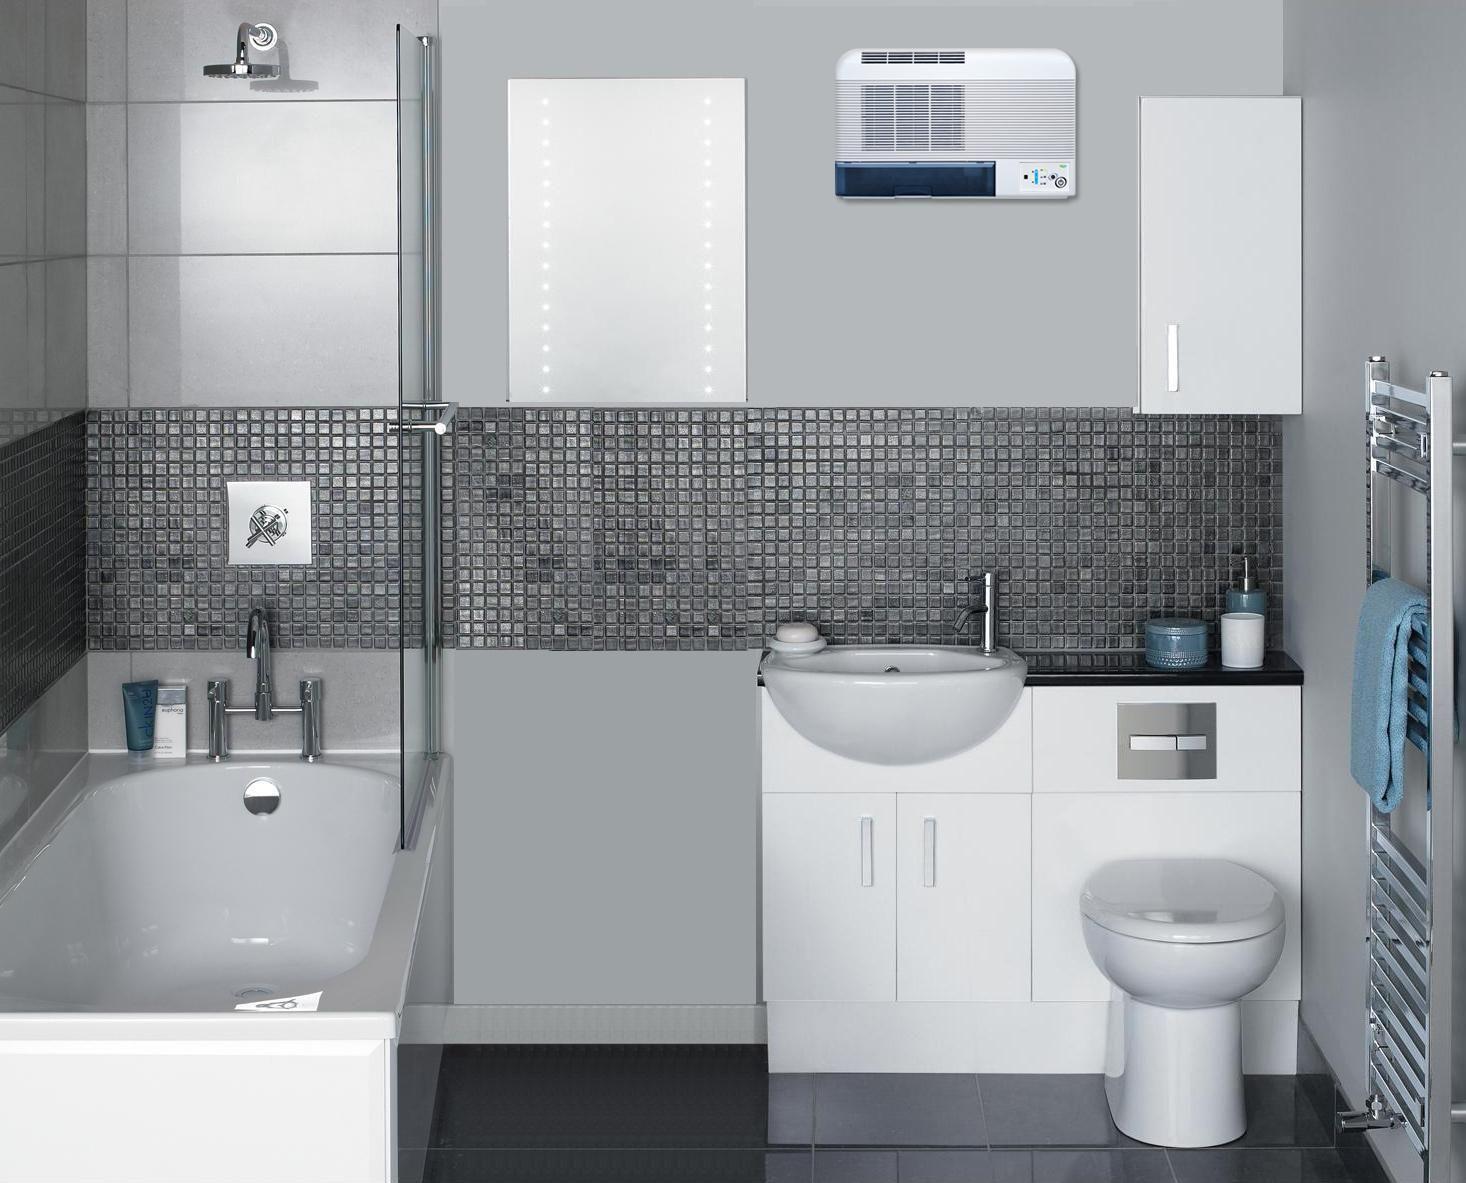 Best Dehumidifier For Bathroom In 2020